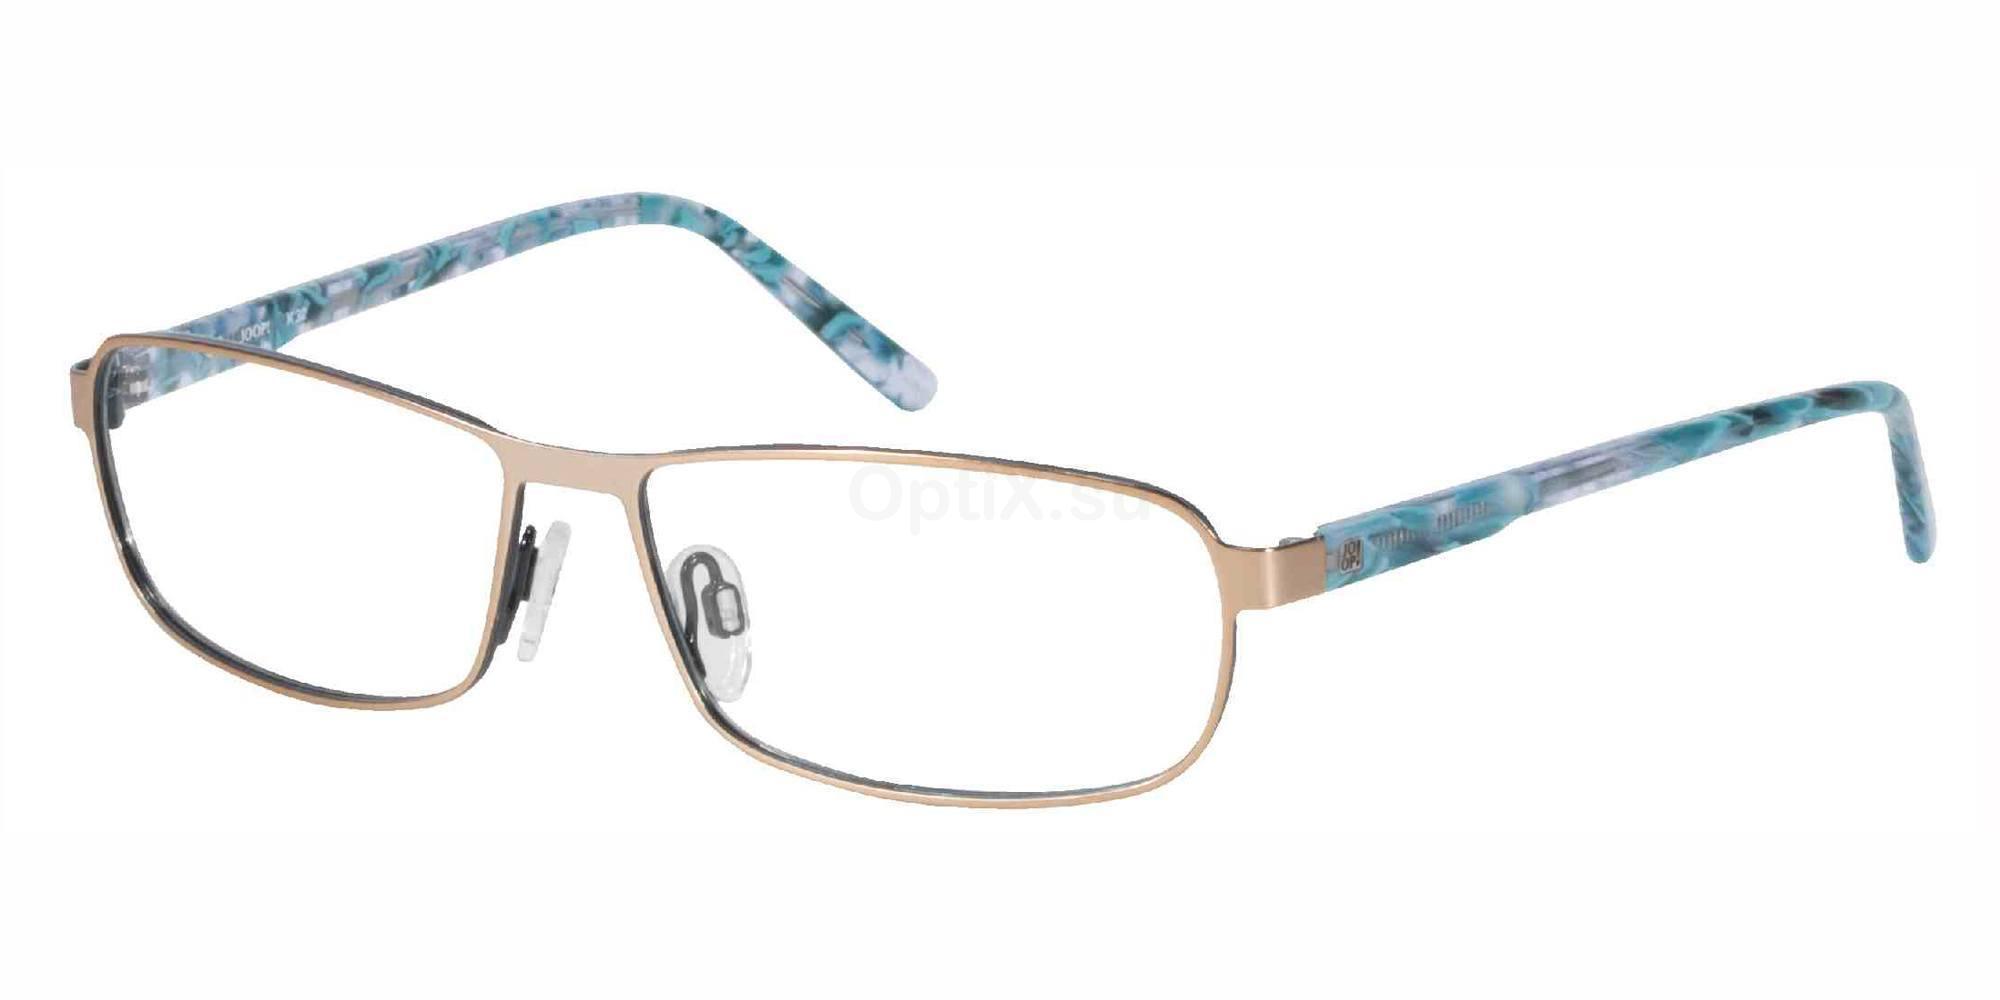 815 83150 , JOOP Eyewear